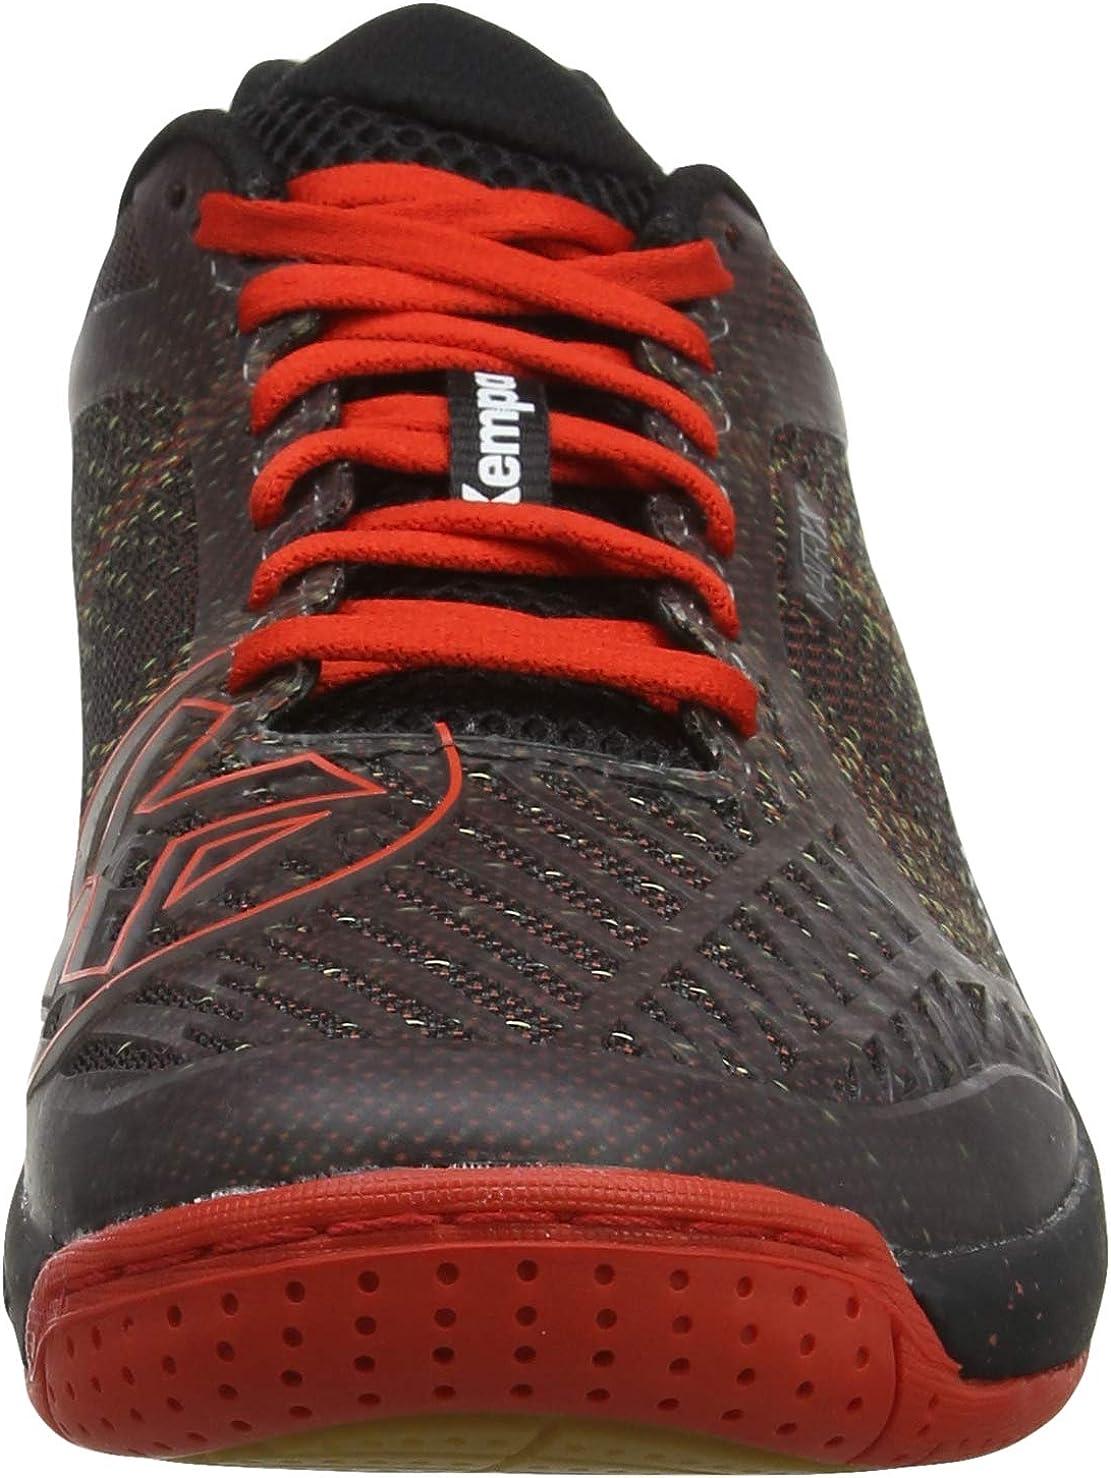 uhlsport Kempa Mens Attack Pro Contender Ebbe /& Flut Handball Shoes Black Schwarz//Lighthouse Rot 03